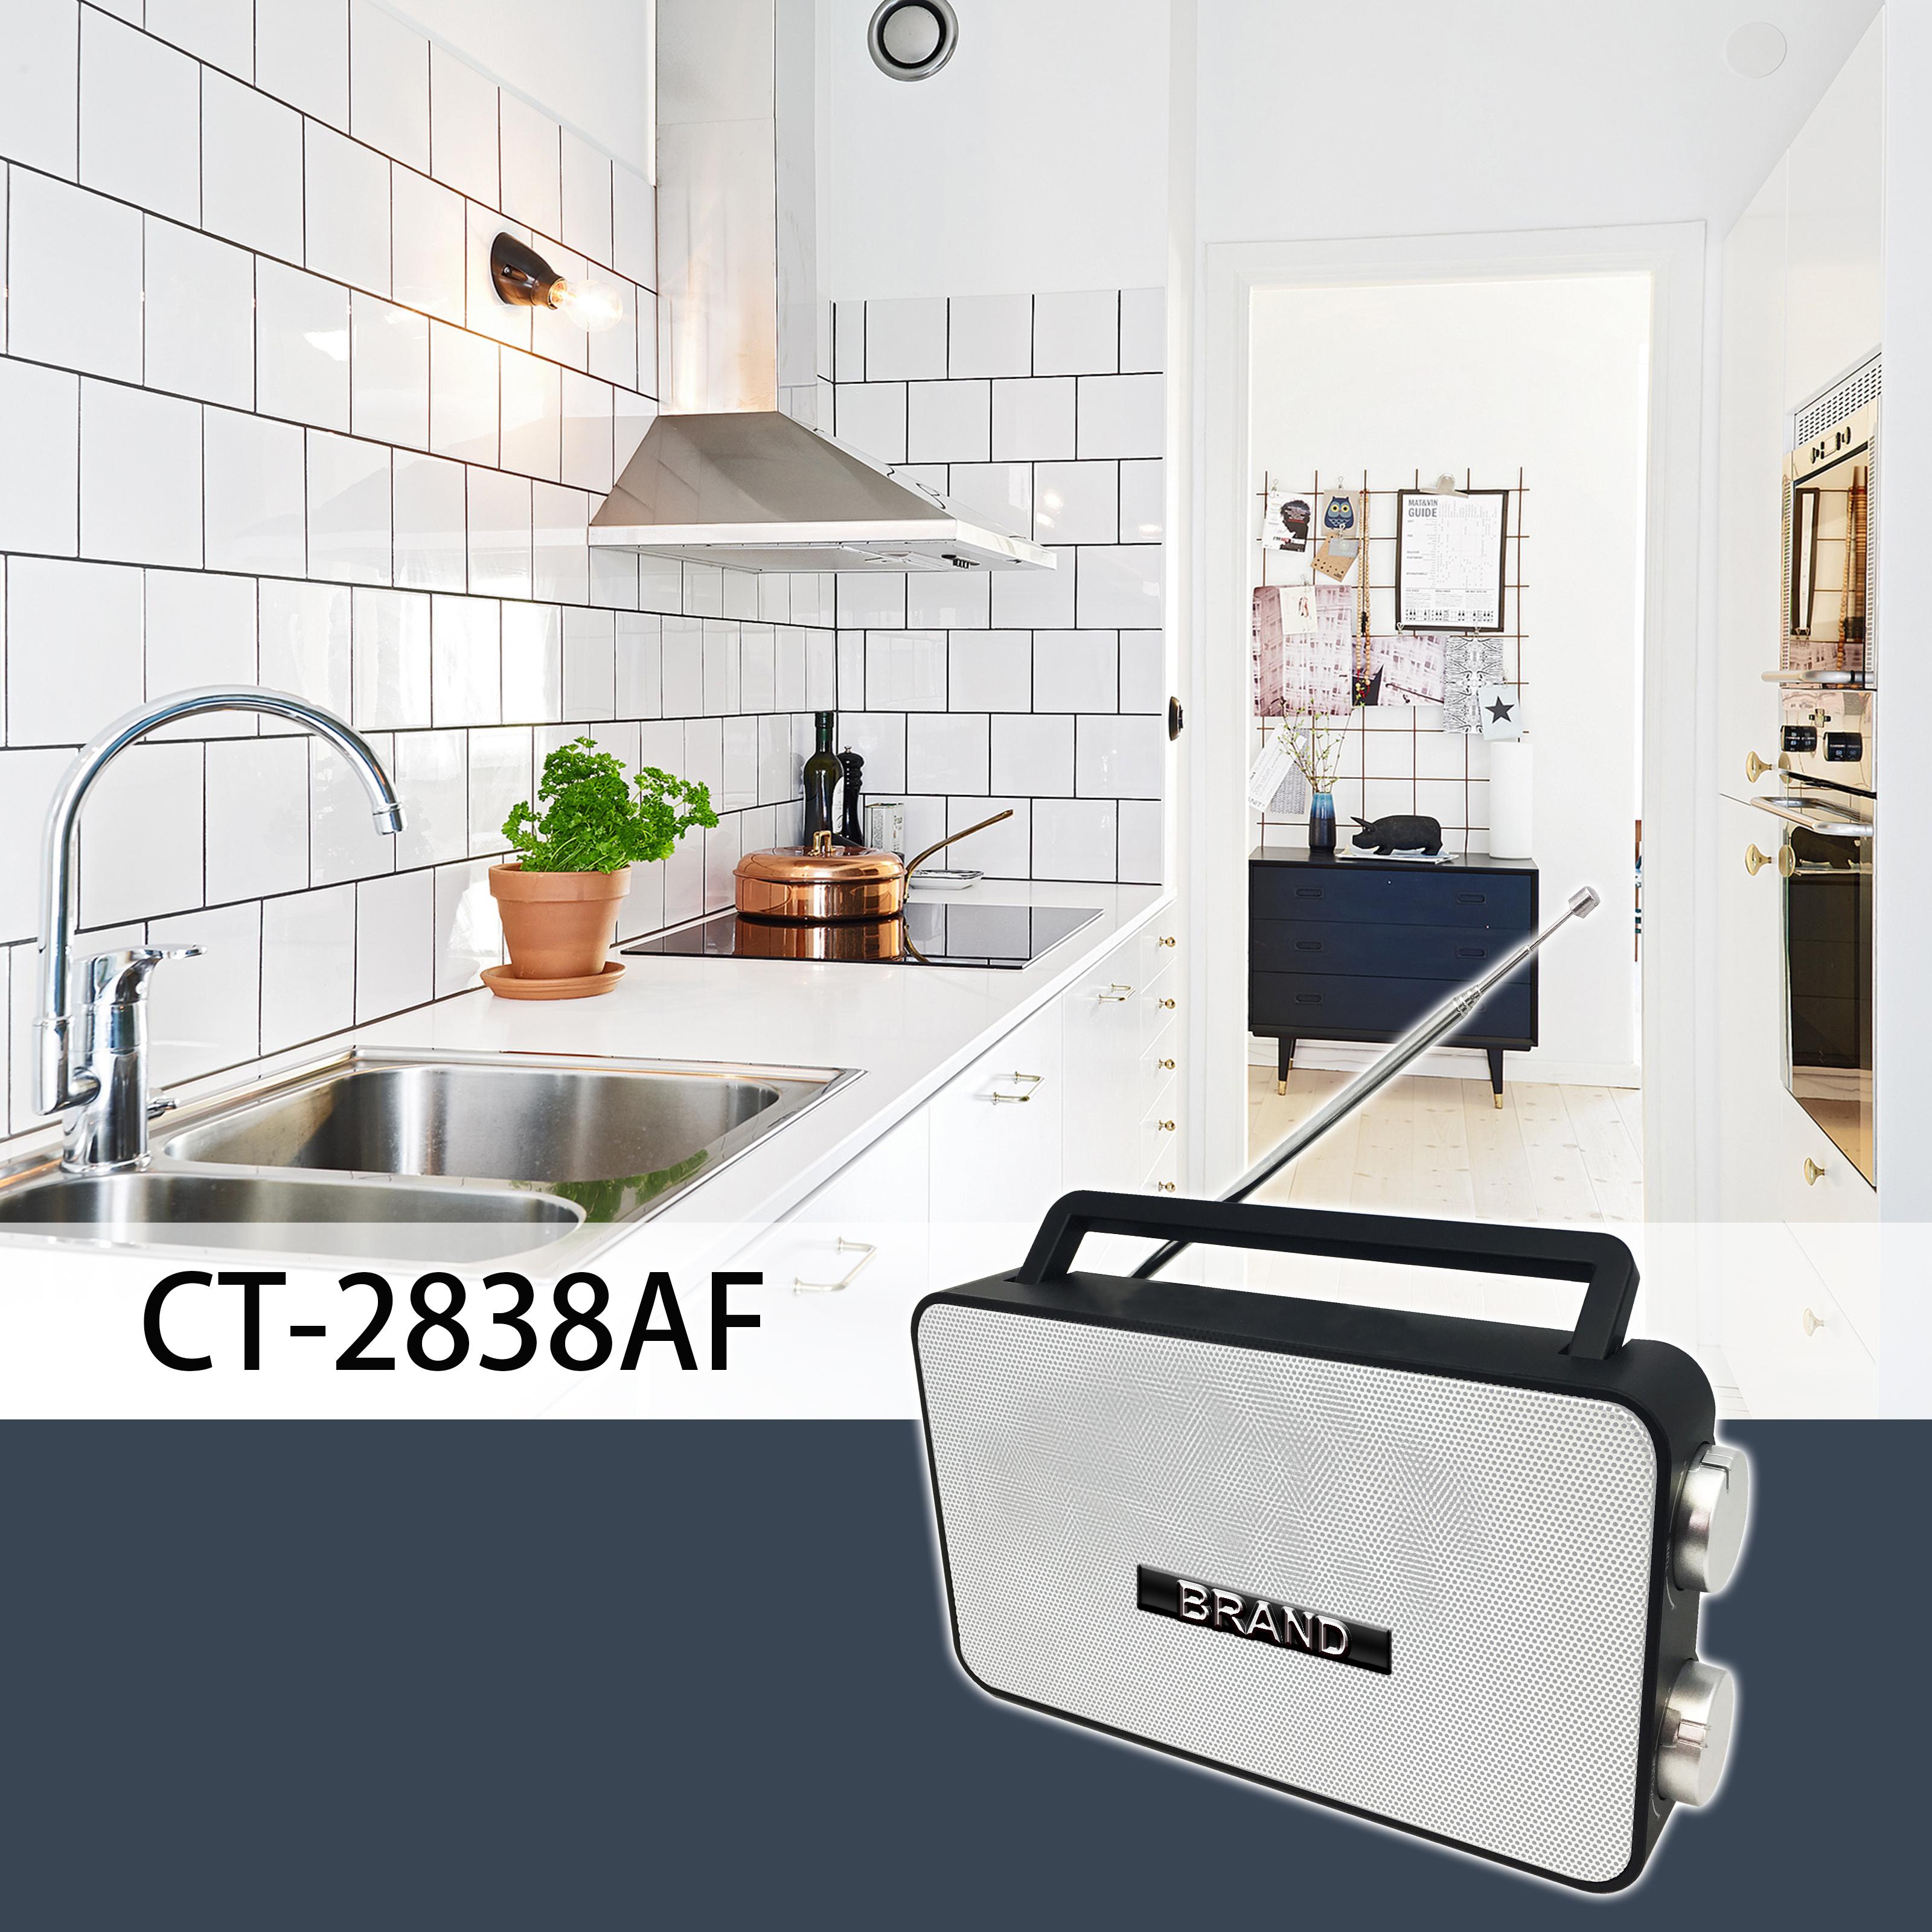 CT-2838AF Kitchen.jpg